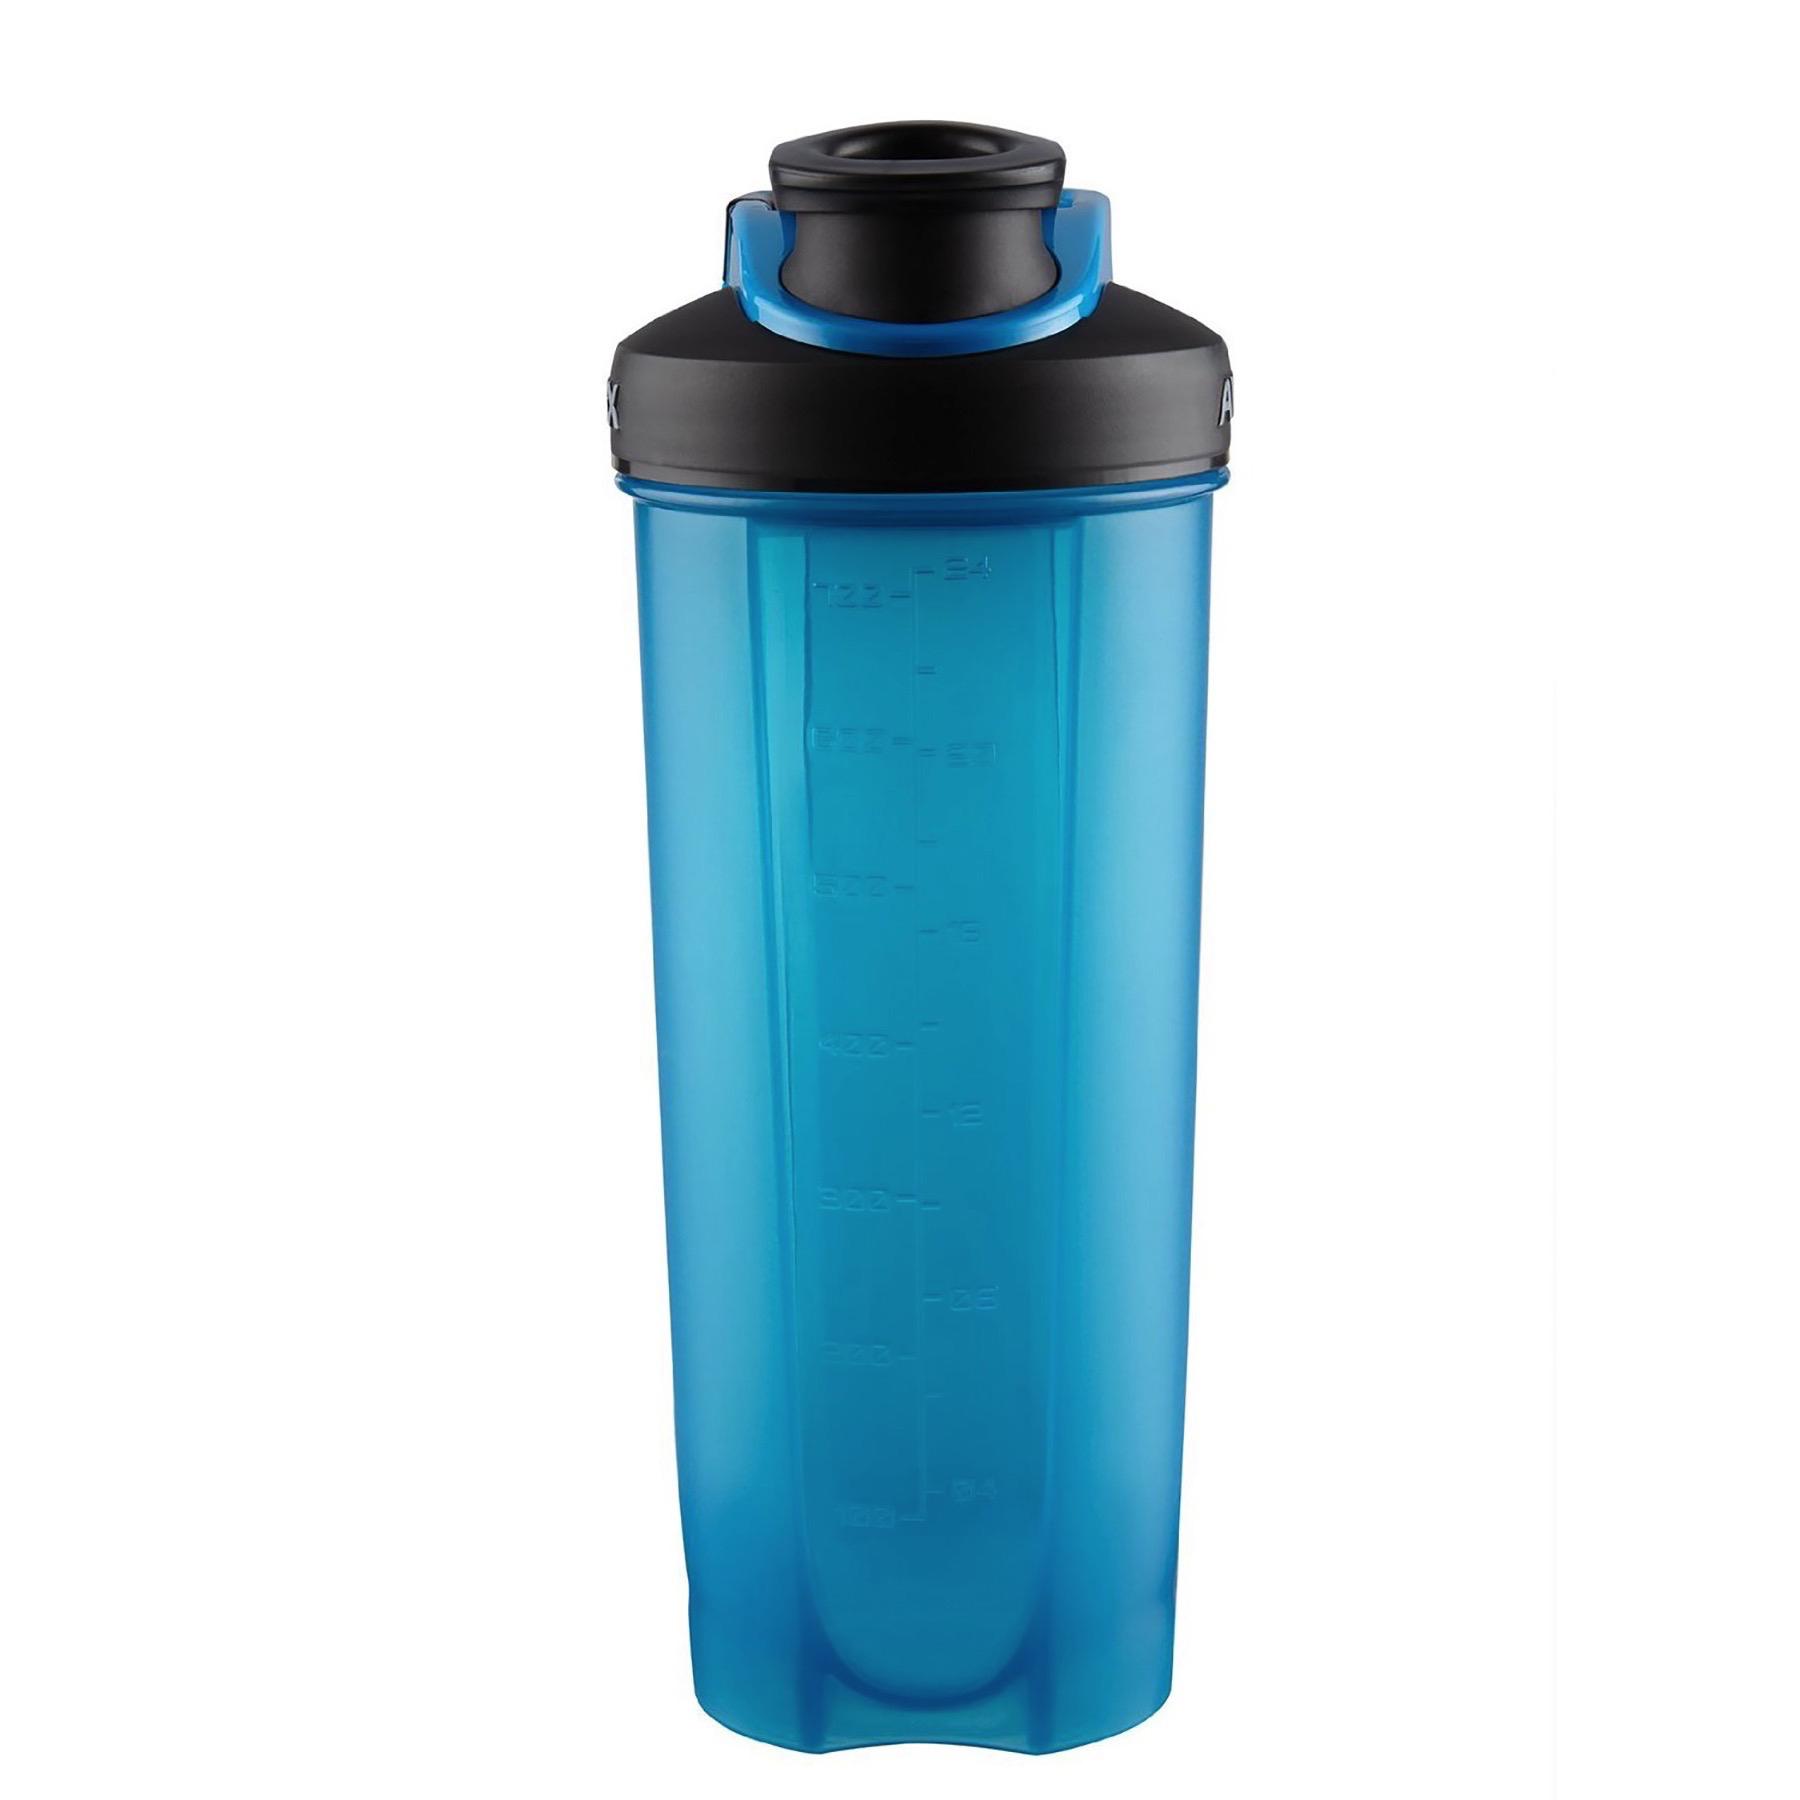 Protein Shaker Net: Avex MixFit Shaker 28oz Blue/Black W/Electric Blue